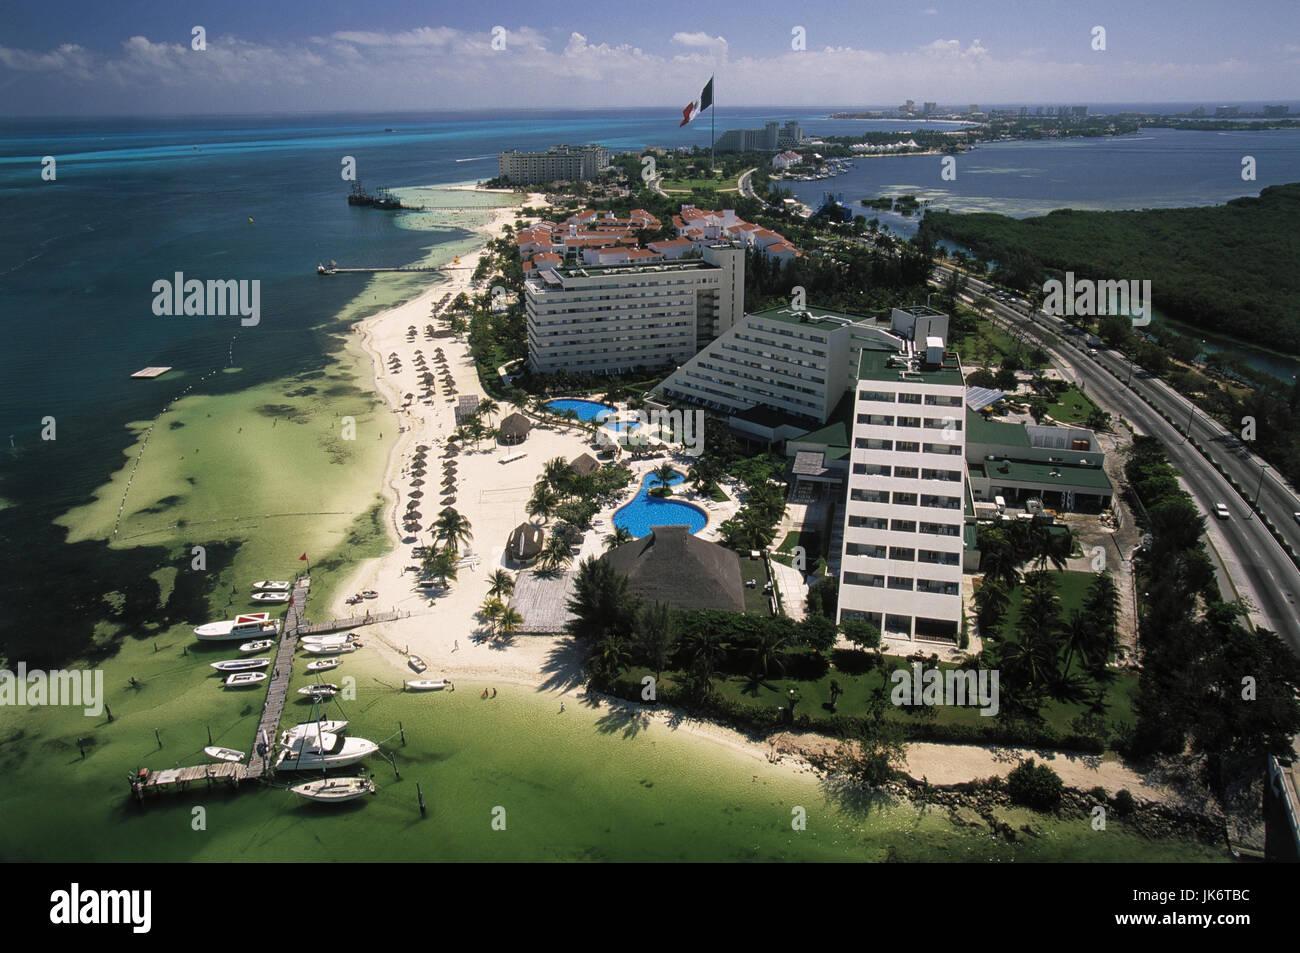 Mexiko, Quintana Roo, Cancun,  Stadtübersicht, Playa Langosta, Bahia de Mujeres Mittelamerika, Stadt, Hochhäuser, - Stock Image